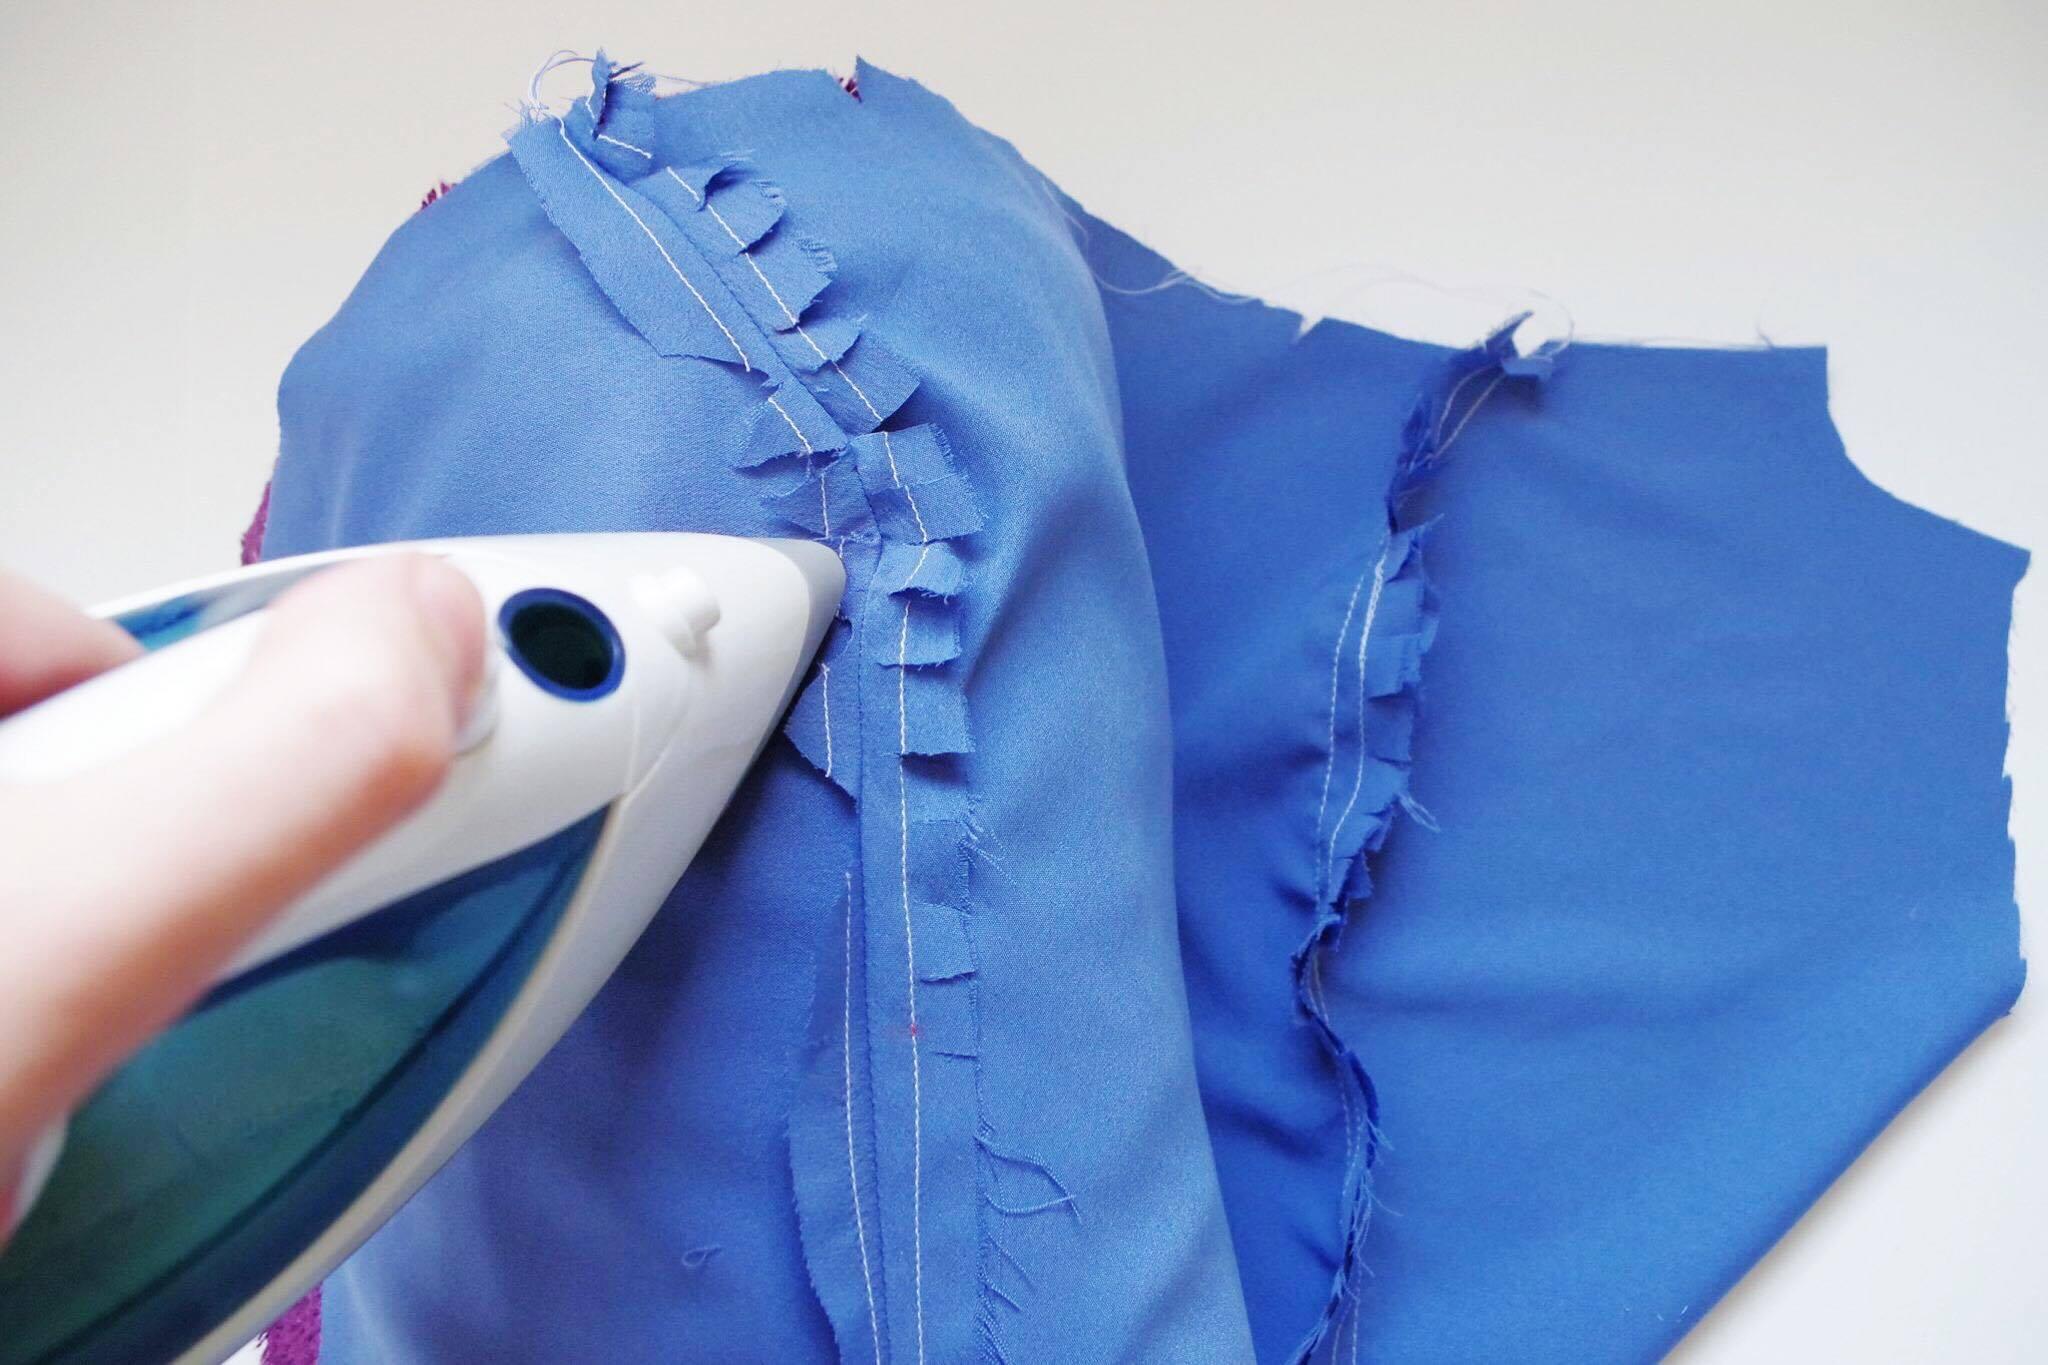 Seven Steps to Sewing Smooth Princess Seams